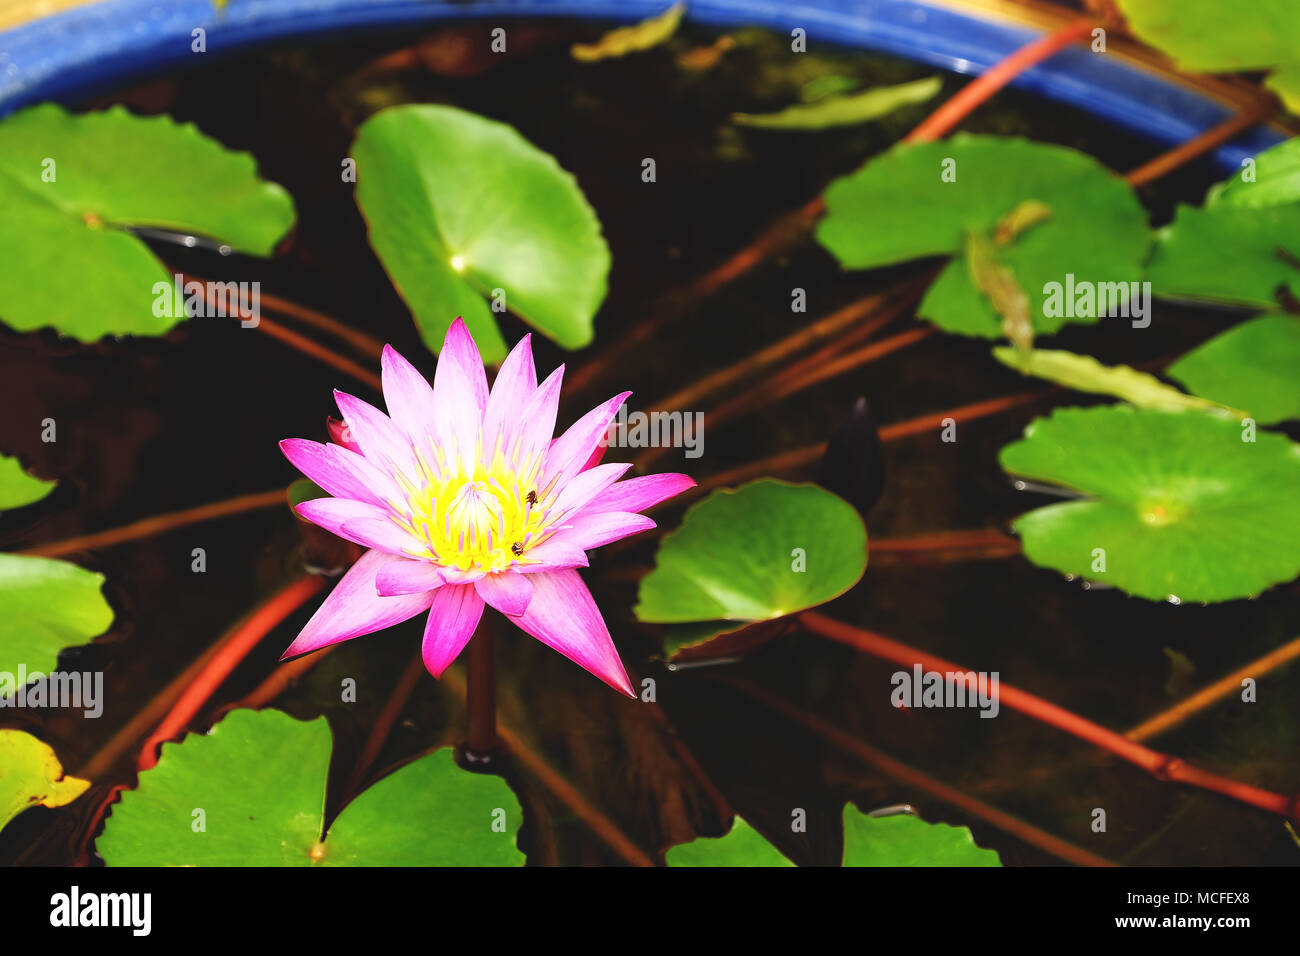 Lotus Flower In Water Bowl Stock Photo 179820544 Alamy